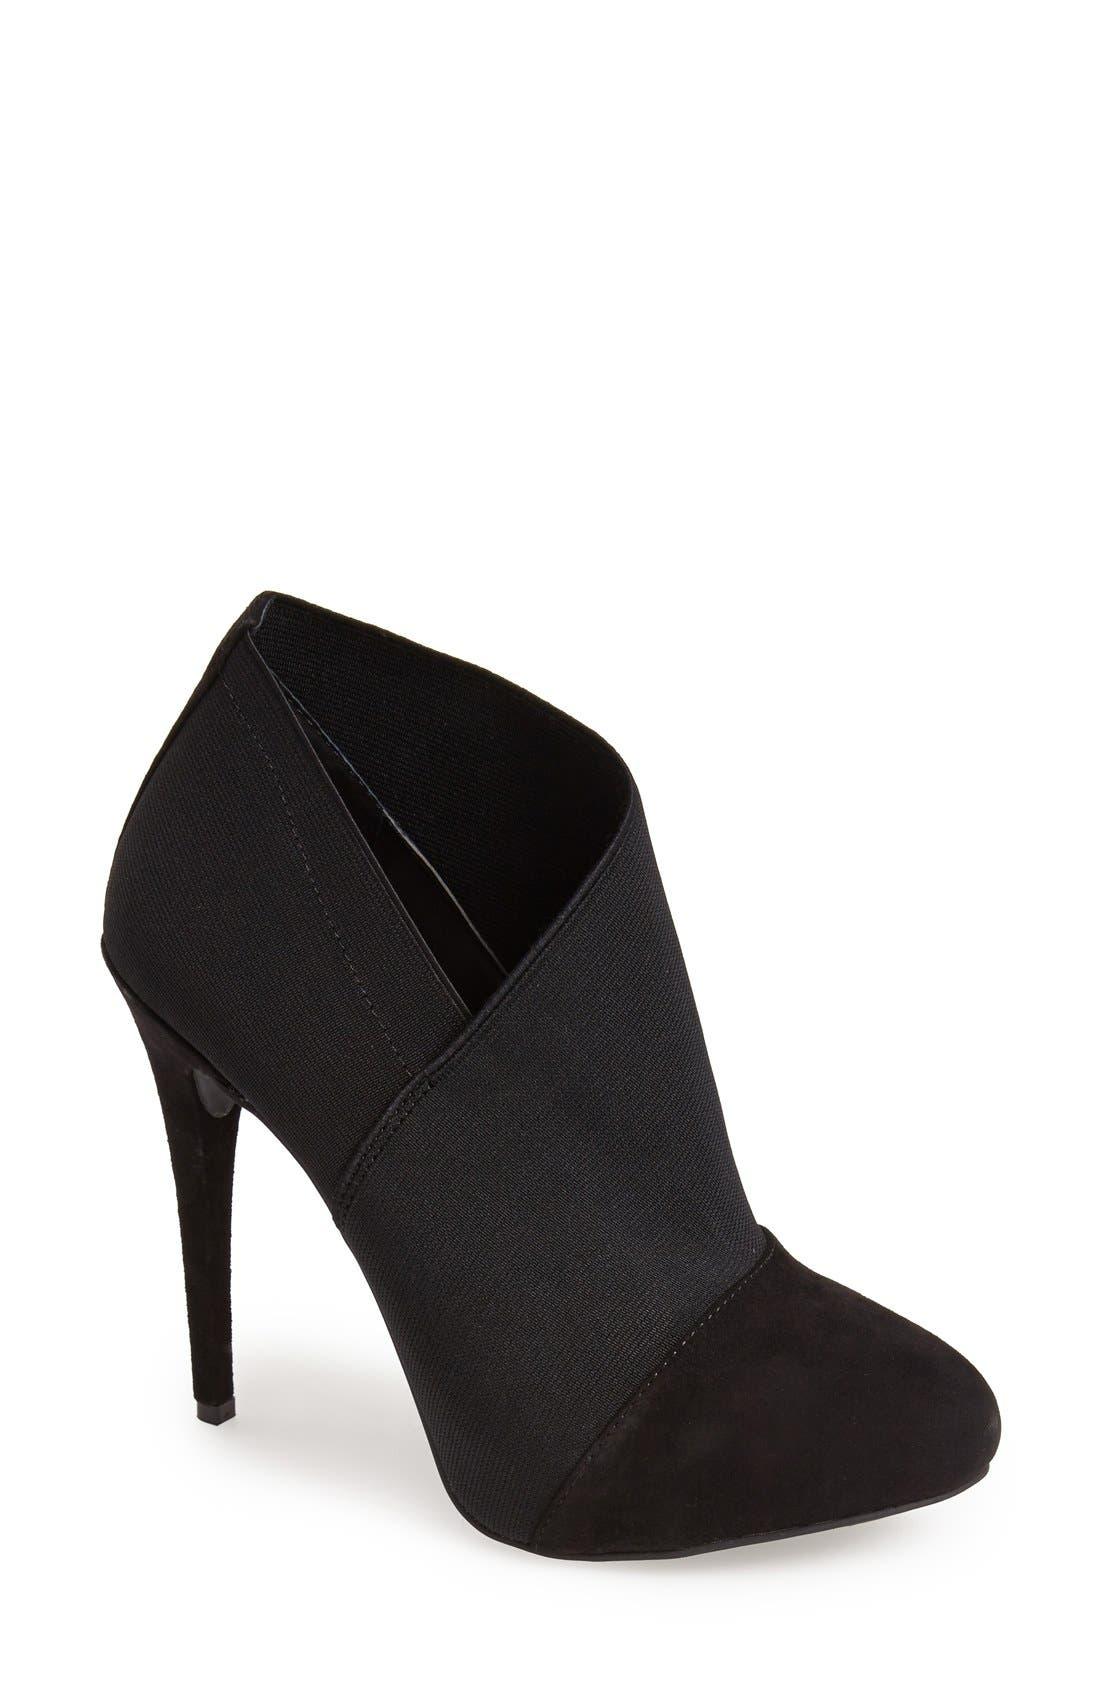 Alternate Image 1 Selected - Jessica Simpson 'Neesha' Stiletto Bootie (Women)